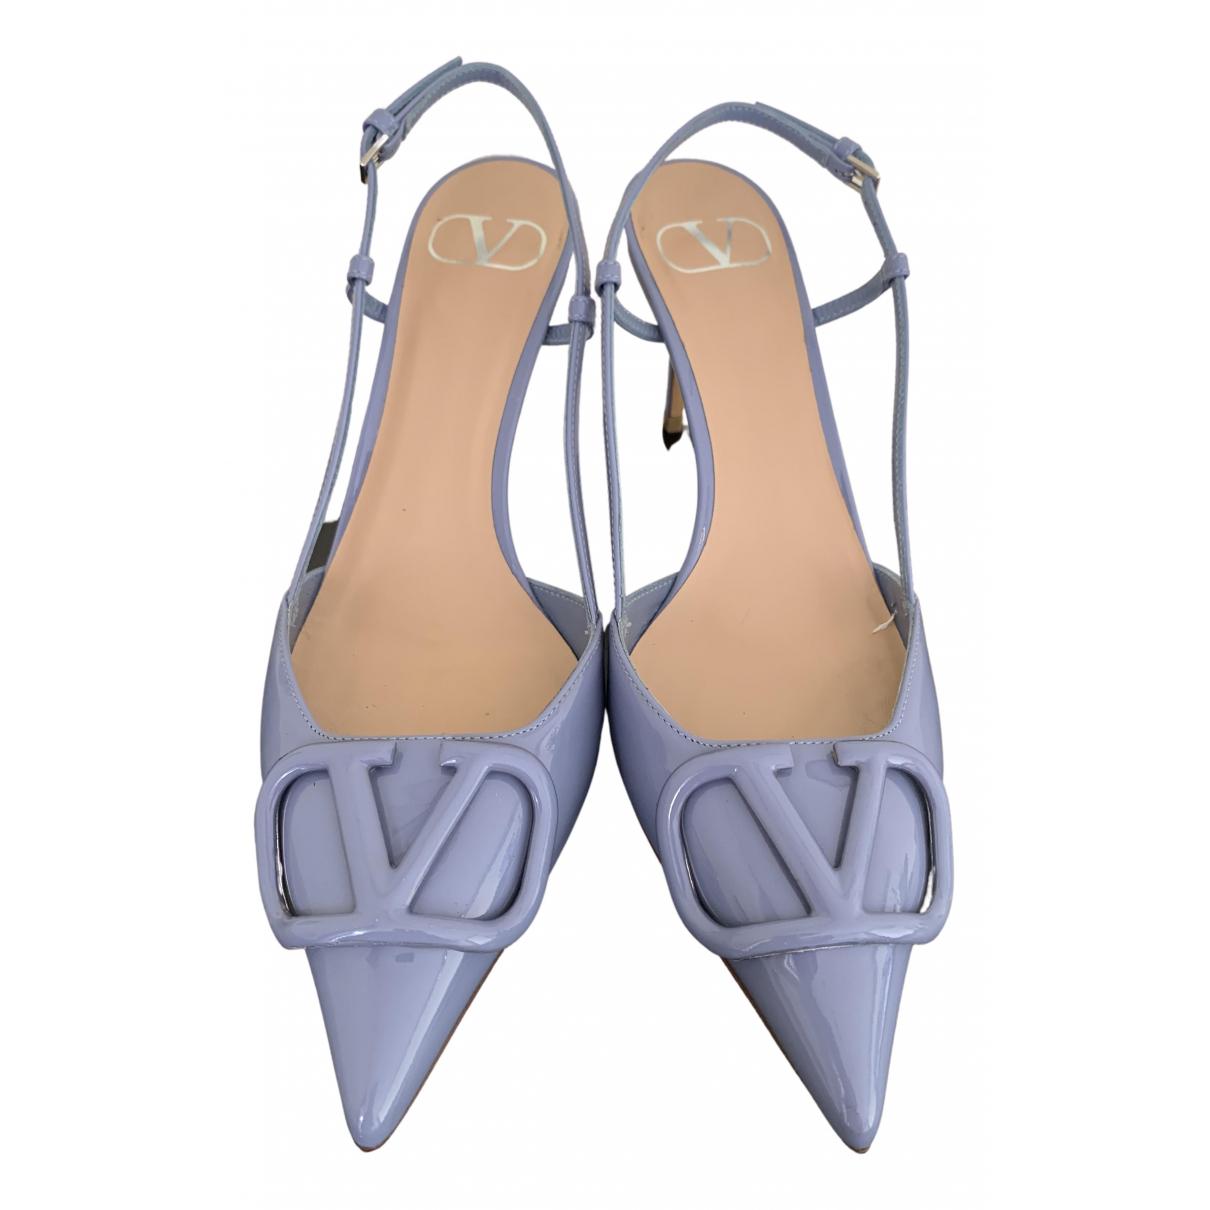 Valentino Garavani VLOGO Blue Patent leather Heels for Women 37.5 IT